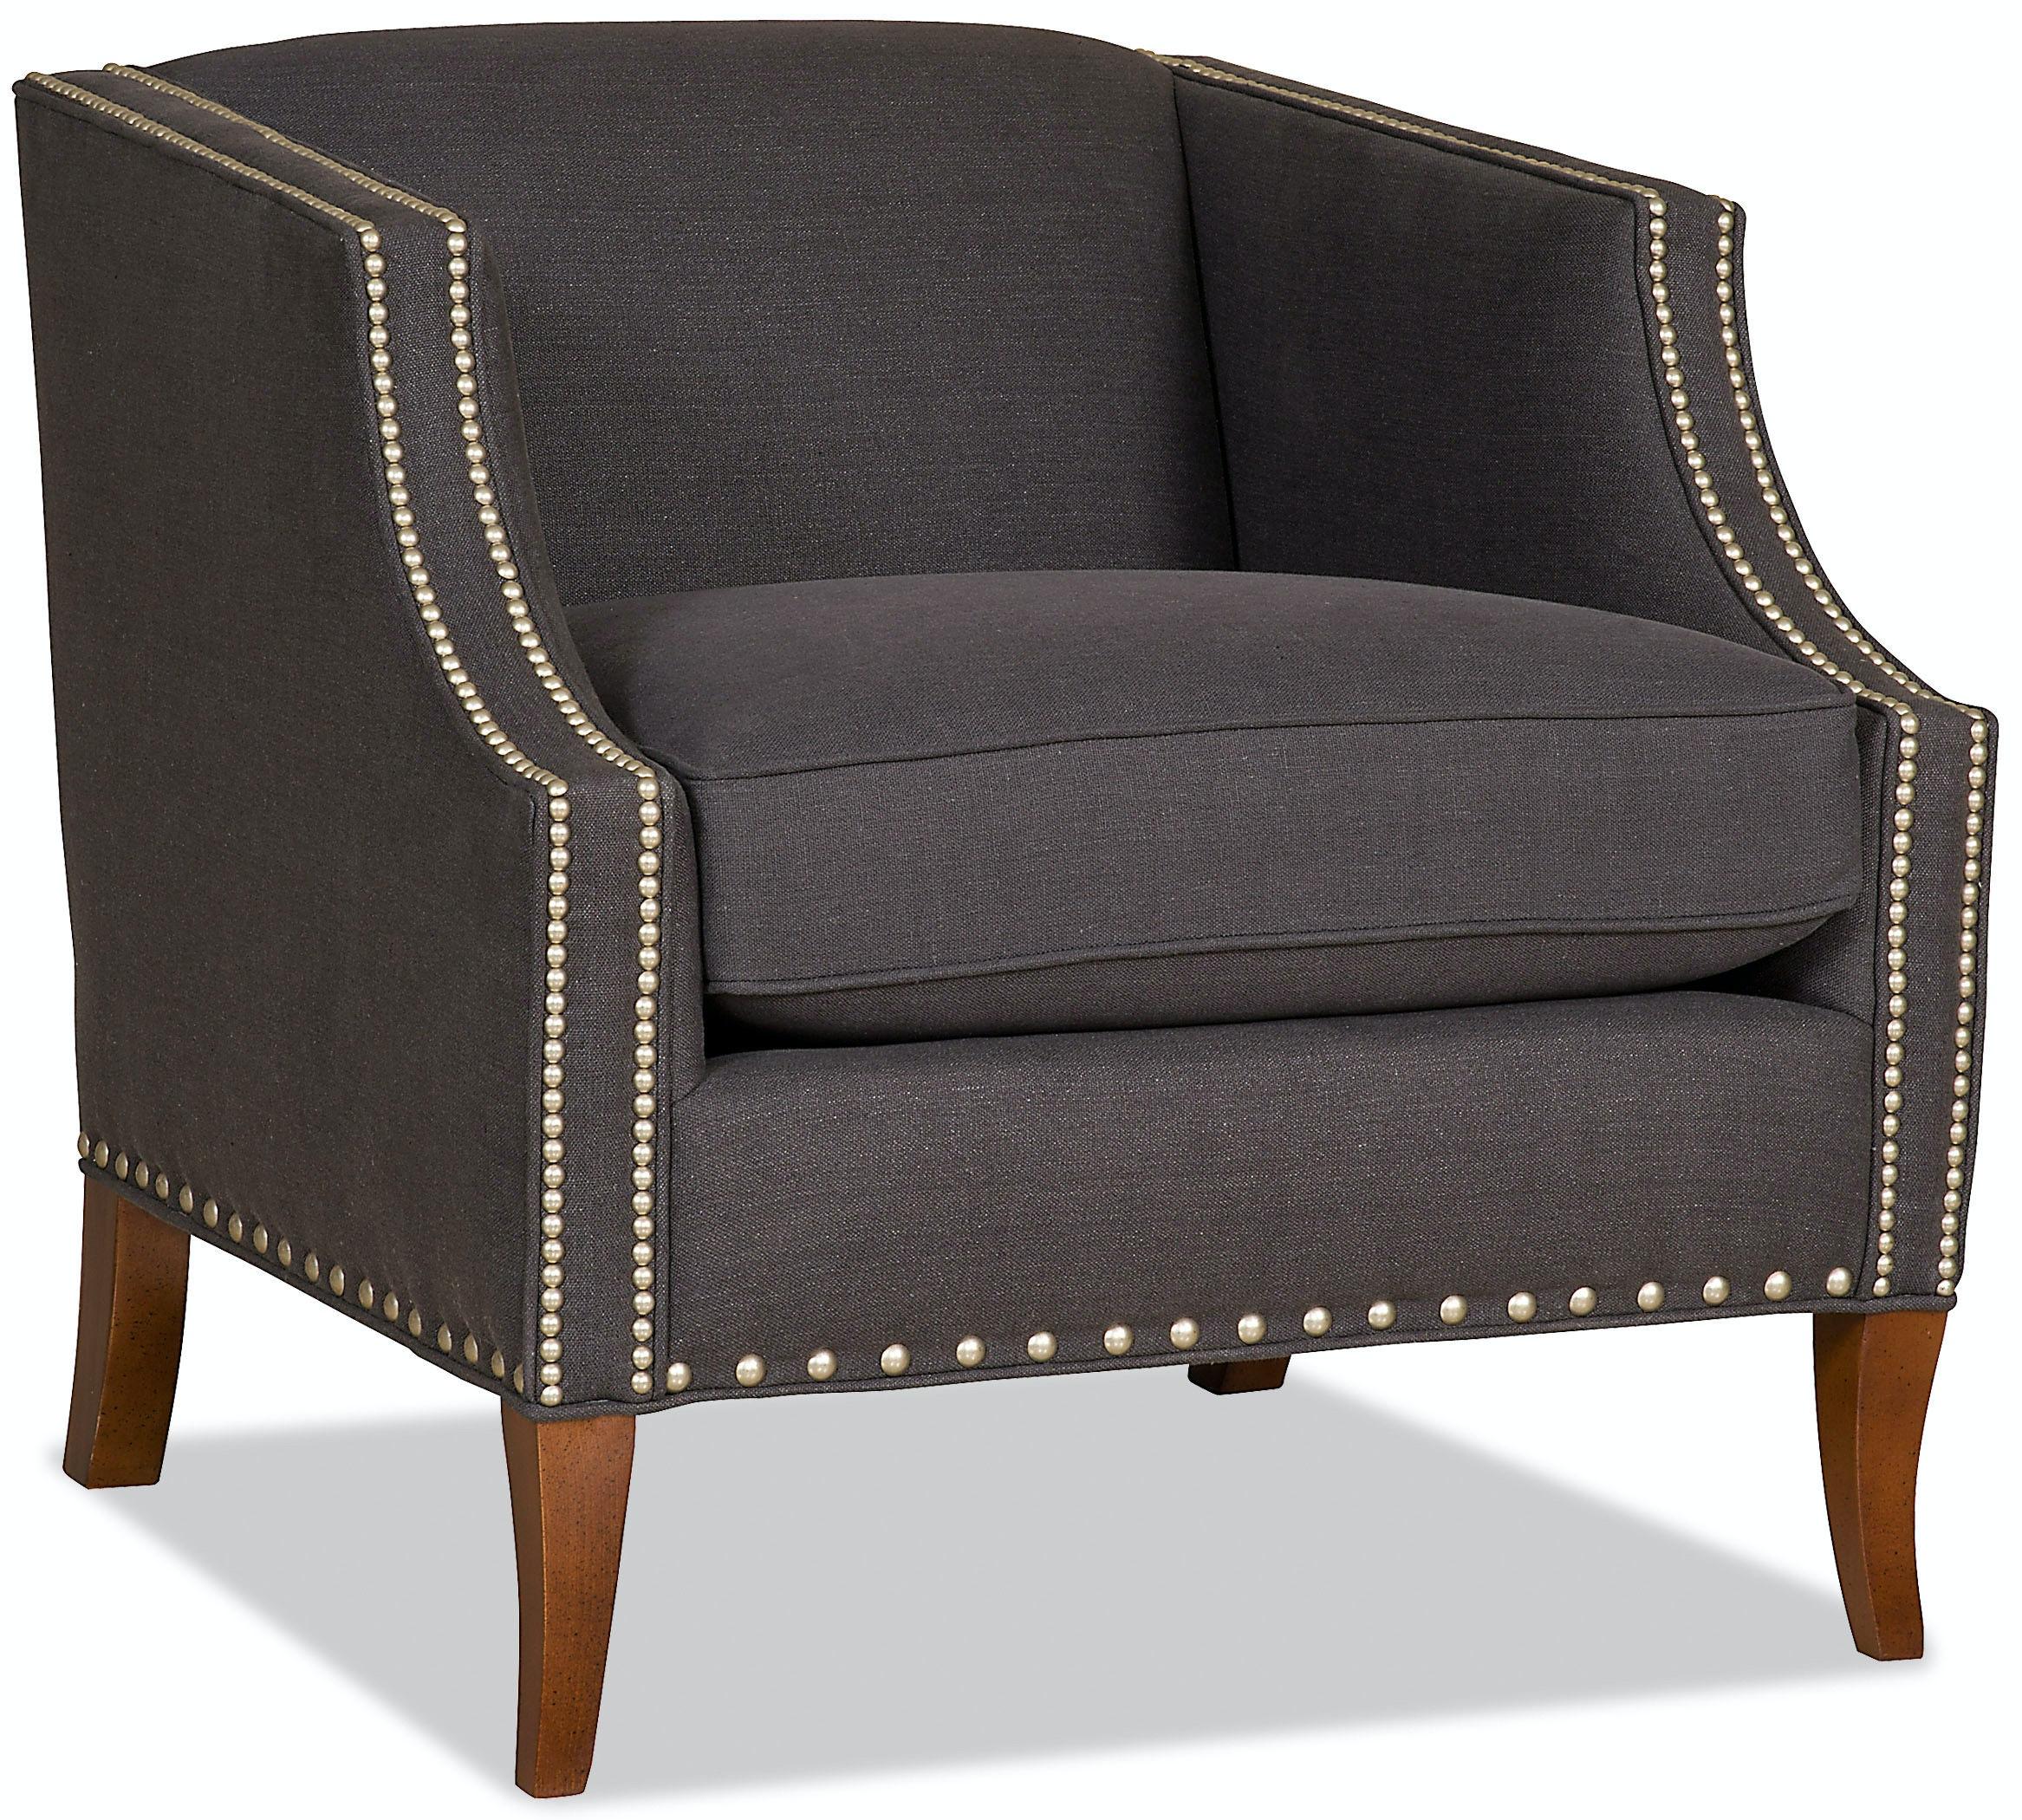 Sam Moore Rory Club Chair 1946